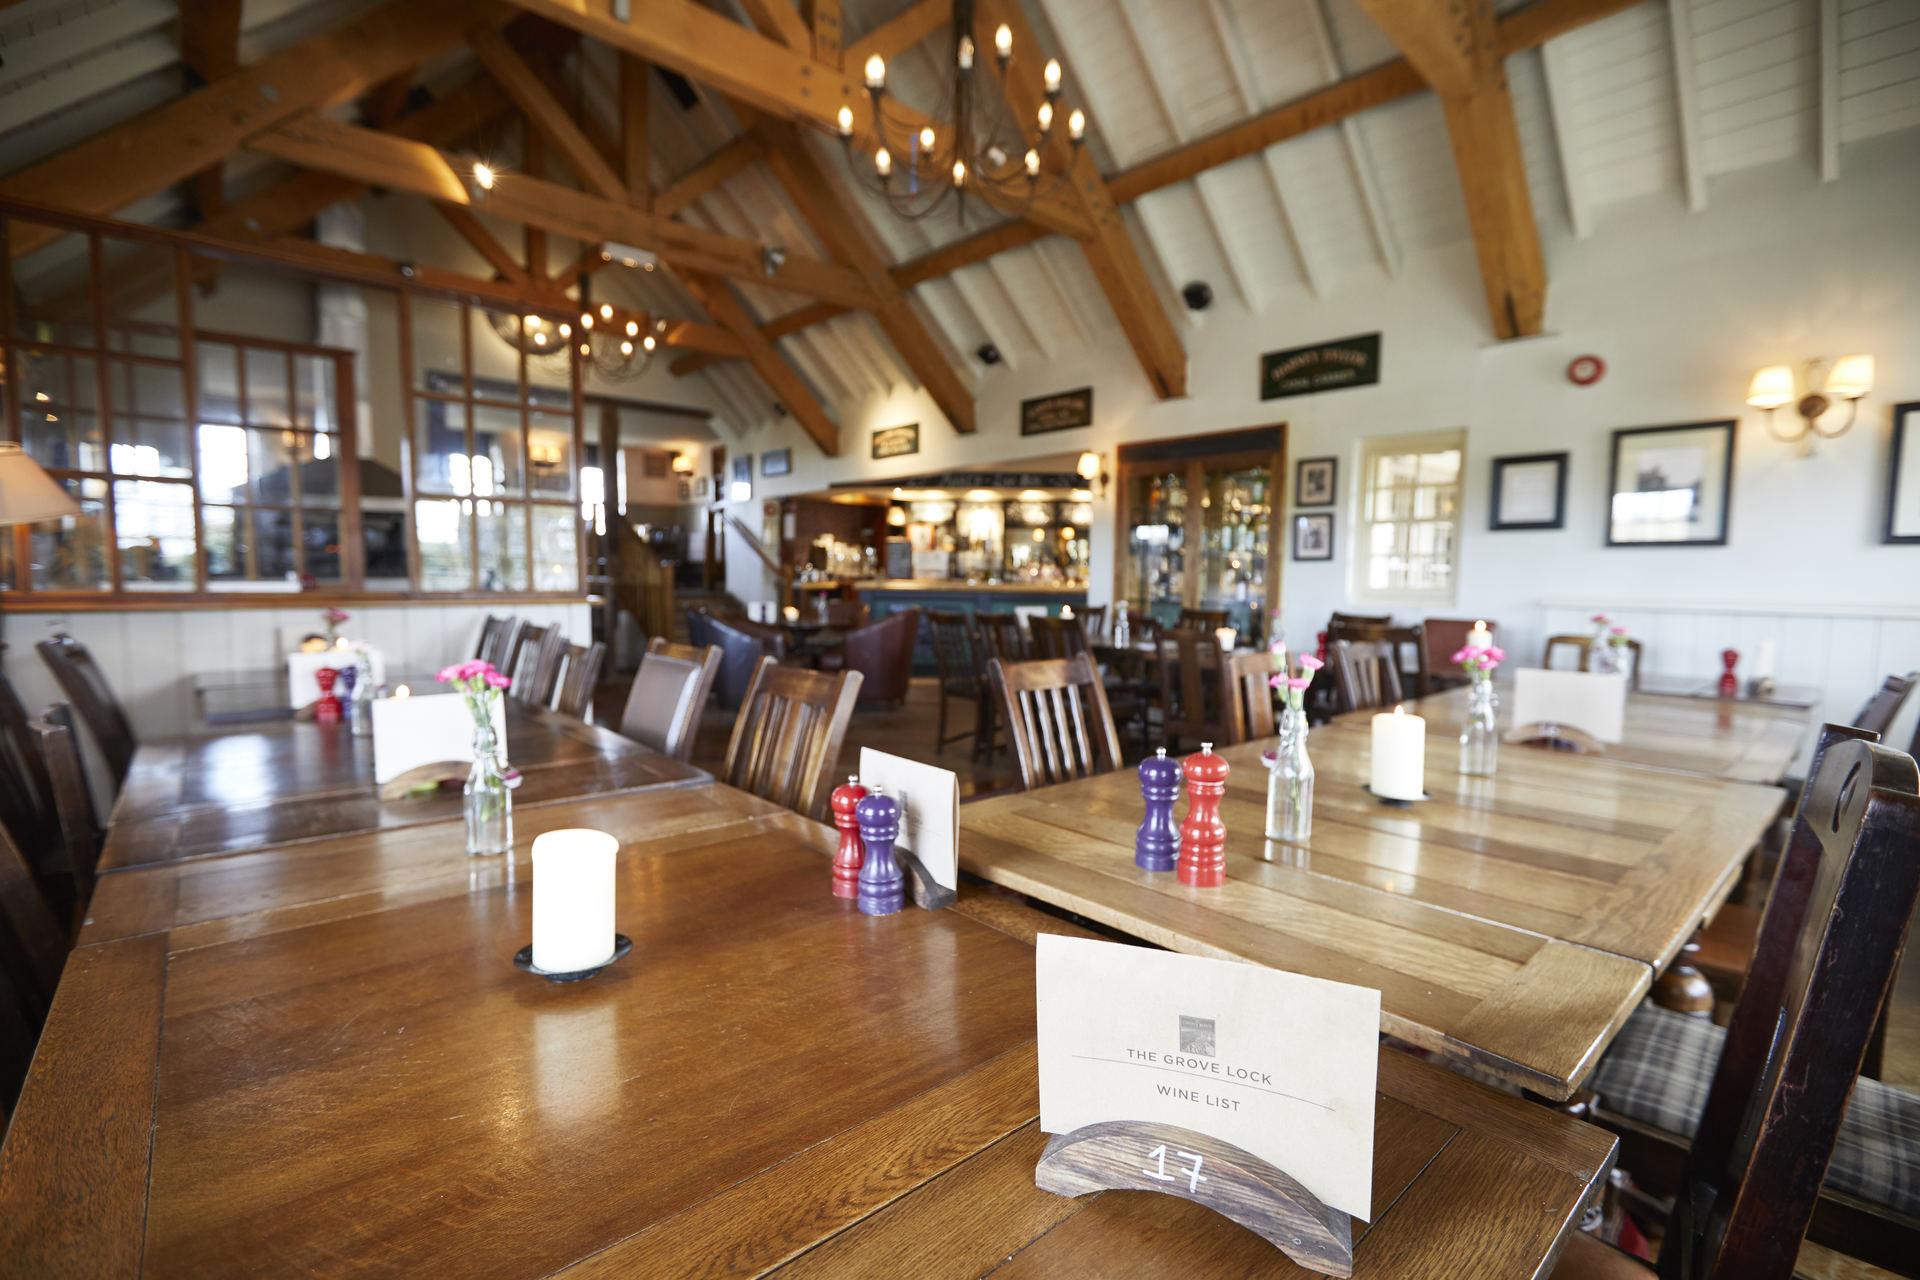 The Grove Lock Fullers Pub And Restaurant In Leighton Buzzard